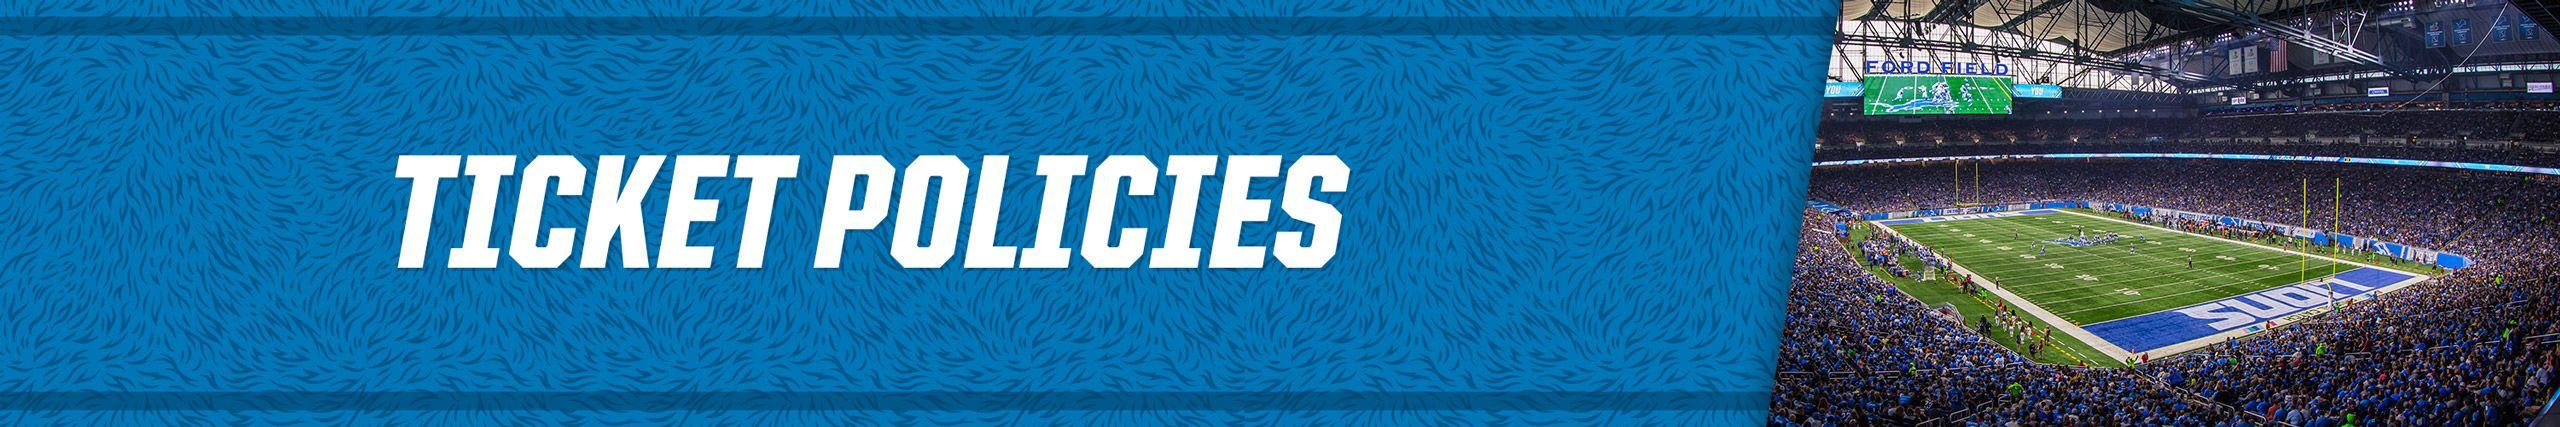 ticket-policies-banner-051118